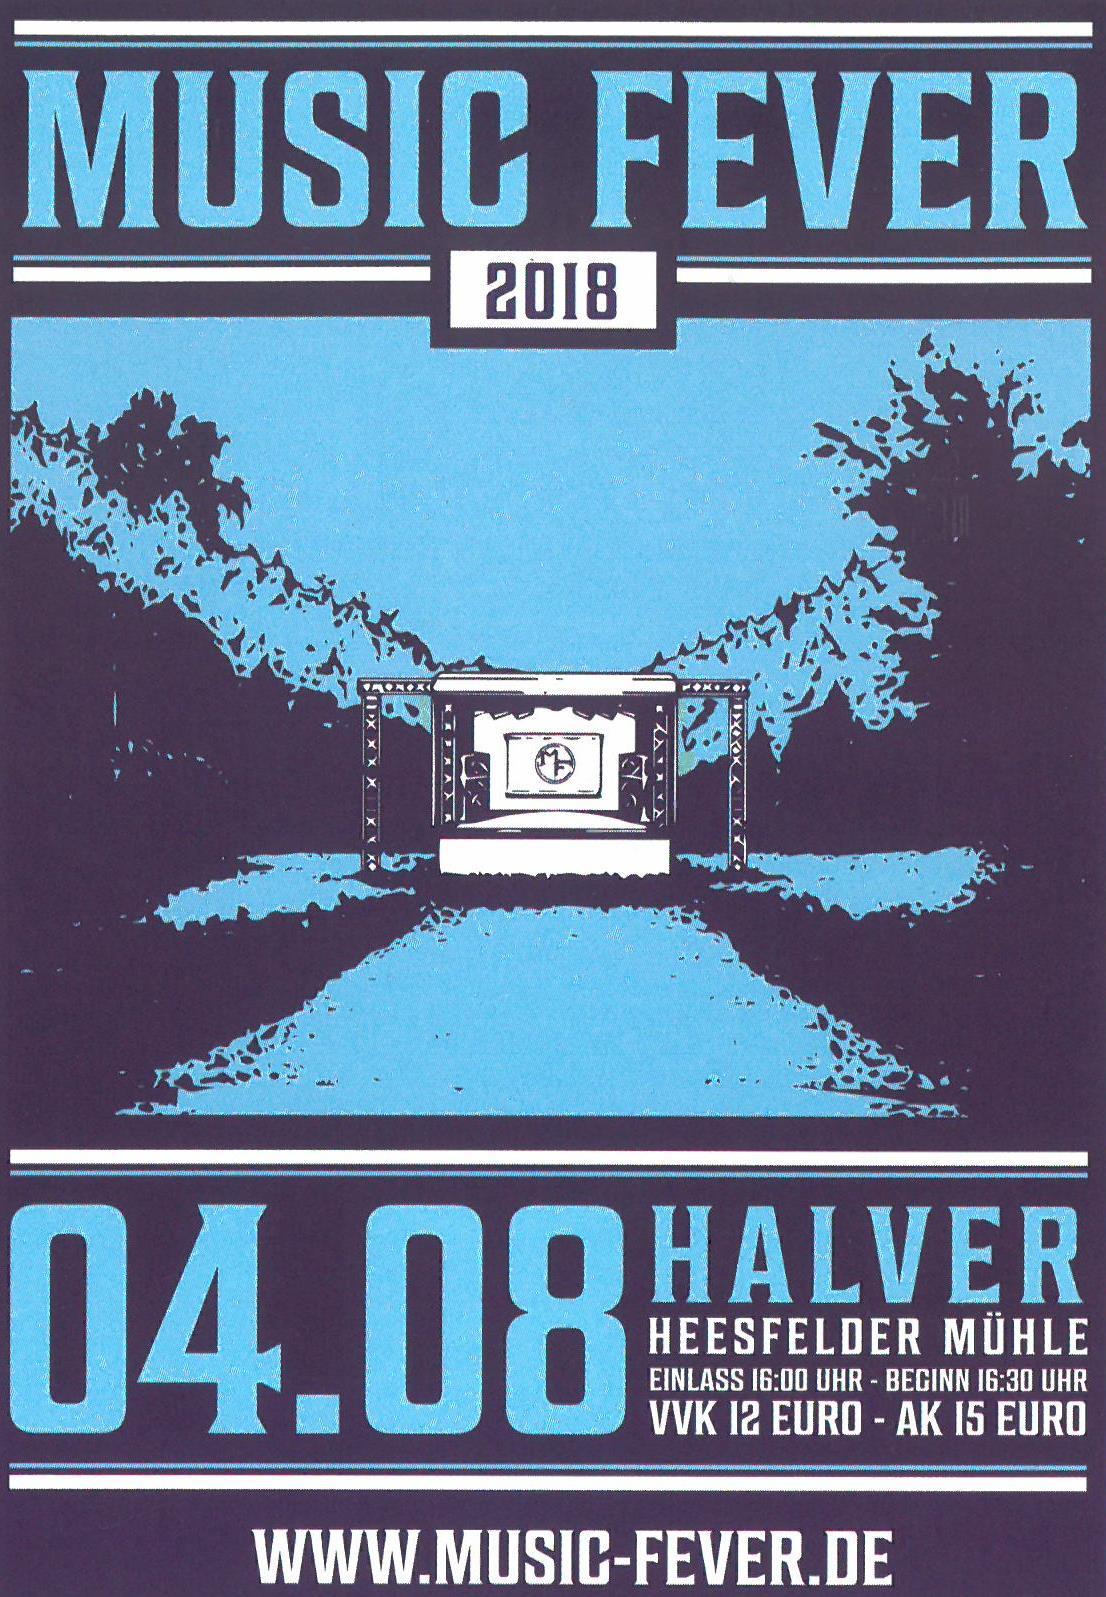 Musicfever 2018